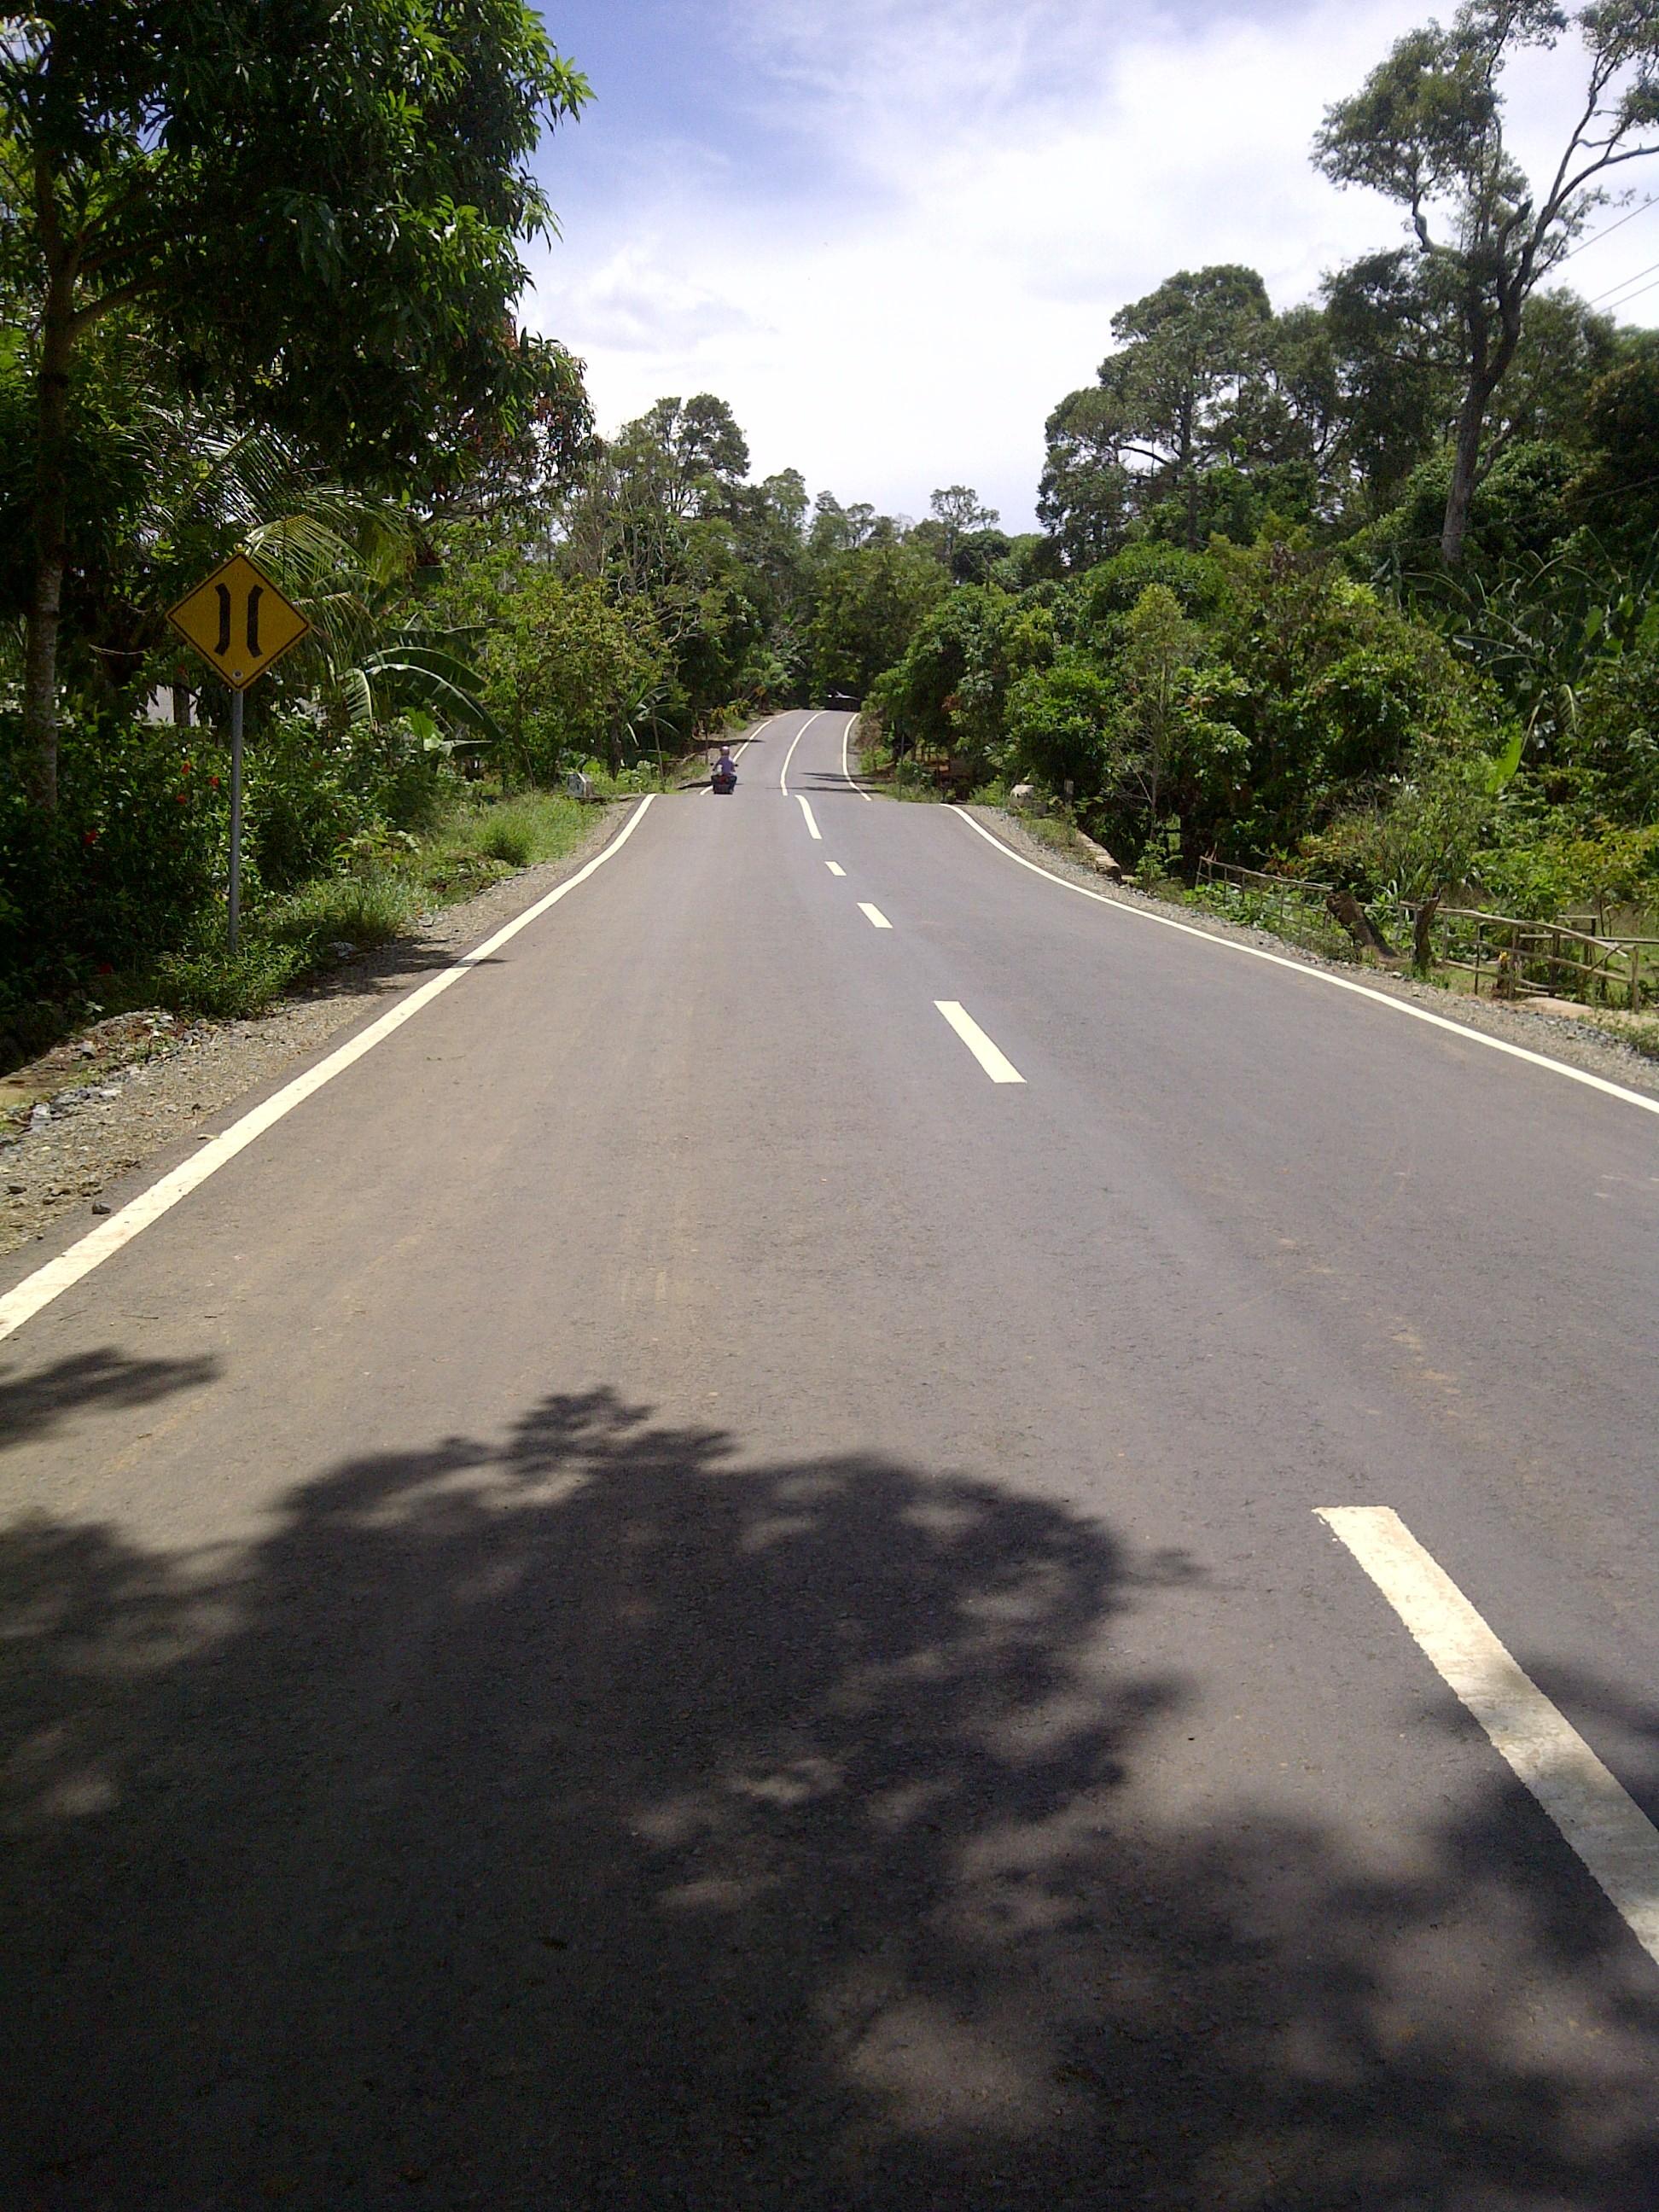 Highway, Road, Street, Traffic, Transportation, HQ Photo